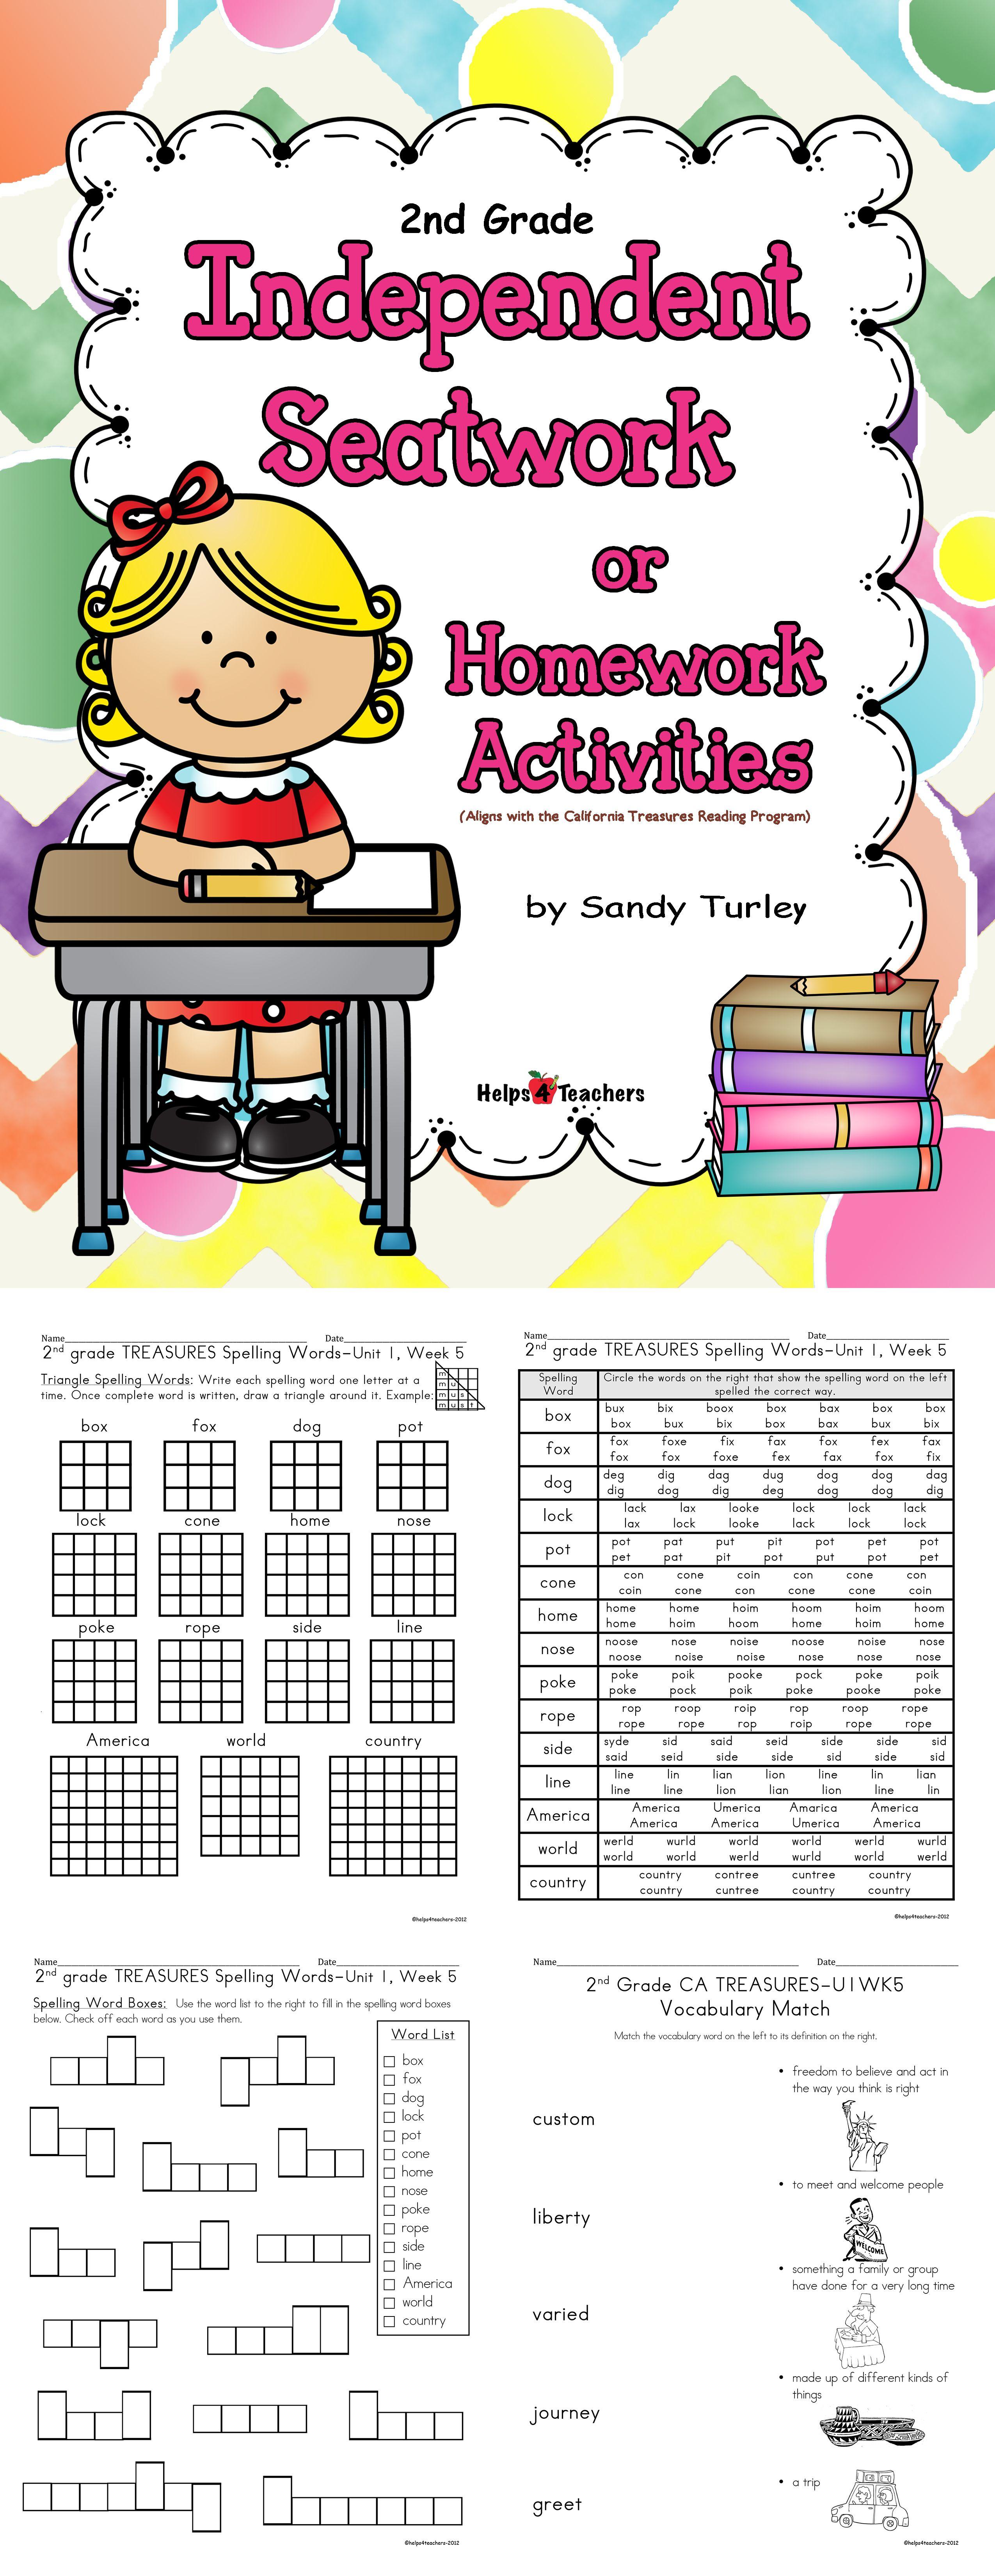 Ccss 2 Rf 2 2nd Grade Independent Seatwork Activities